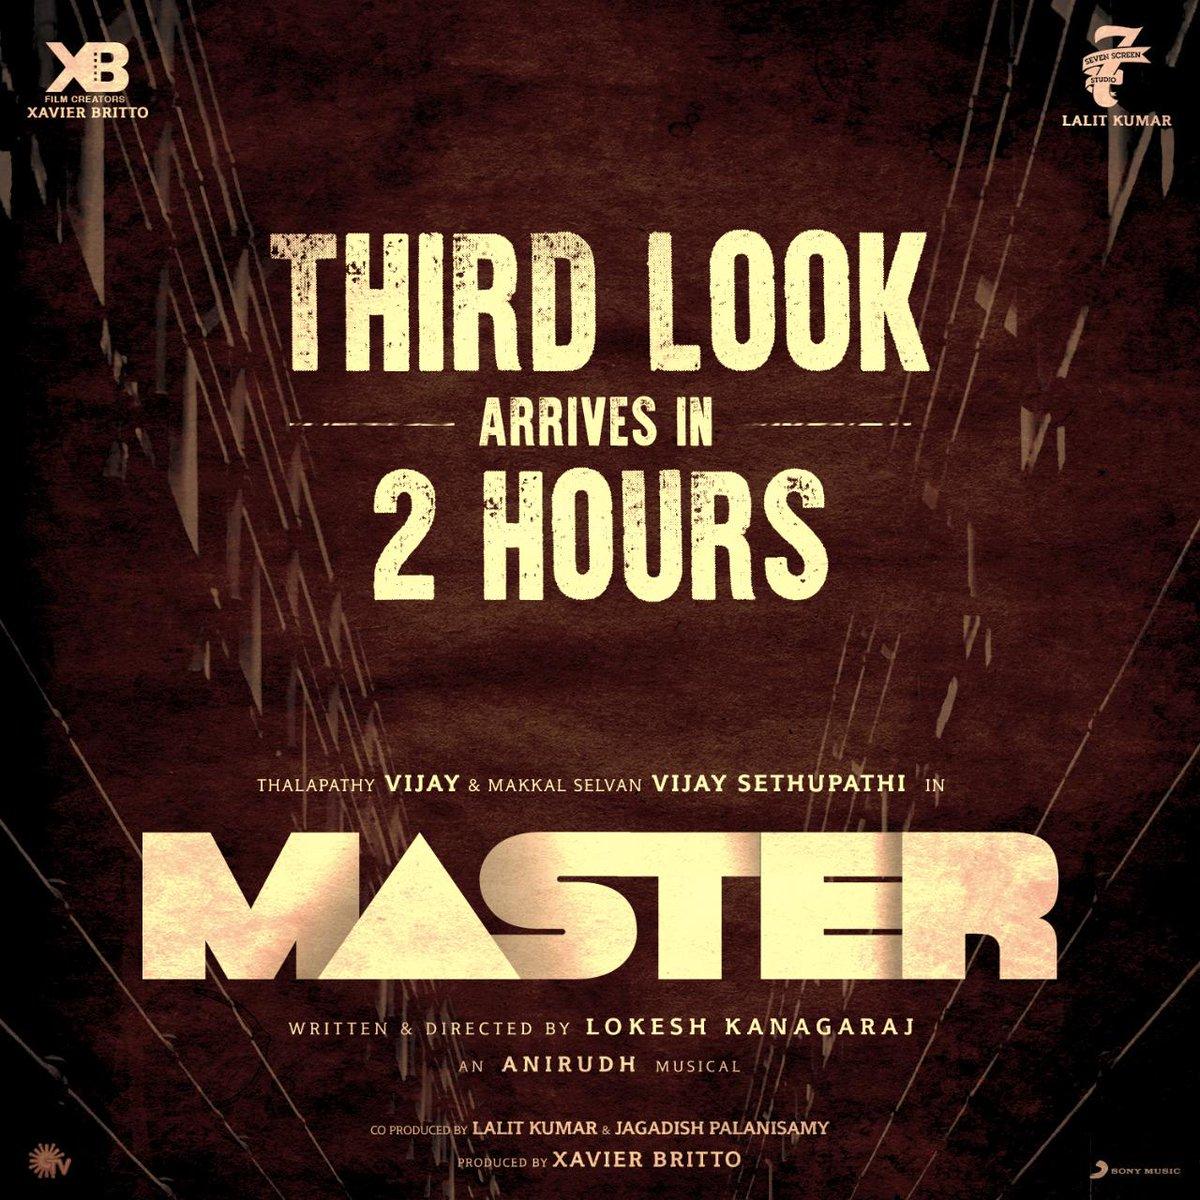 The wait is almost over!   What's the excitement level like Nanba? 😉   #Master #MasterThirdLook  @actorvijay @VijaySethuOffl @Dir_Lokesh @anirudhofficial @jagadishbliss @Lalit_sevenscr @imKBRshanthnu @MalavikaM_ @andrea_jeremiah @gopiprasannaa